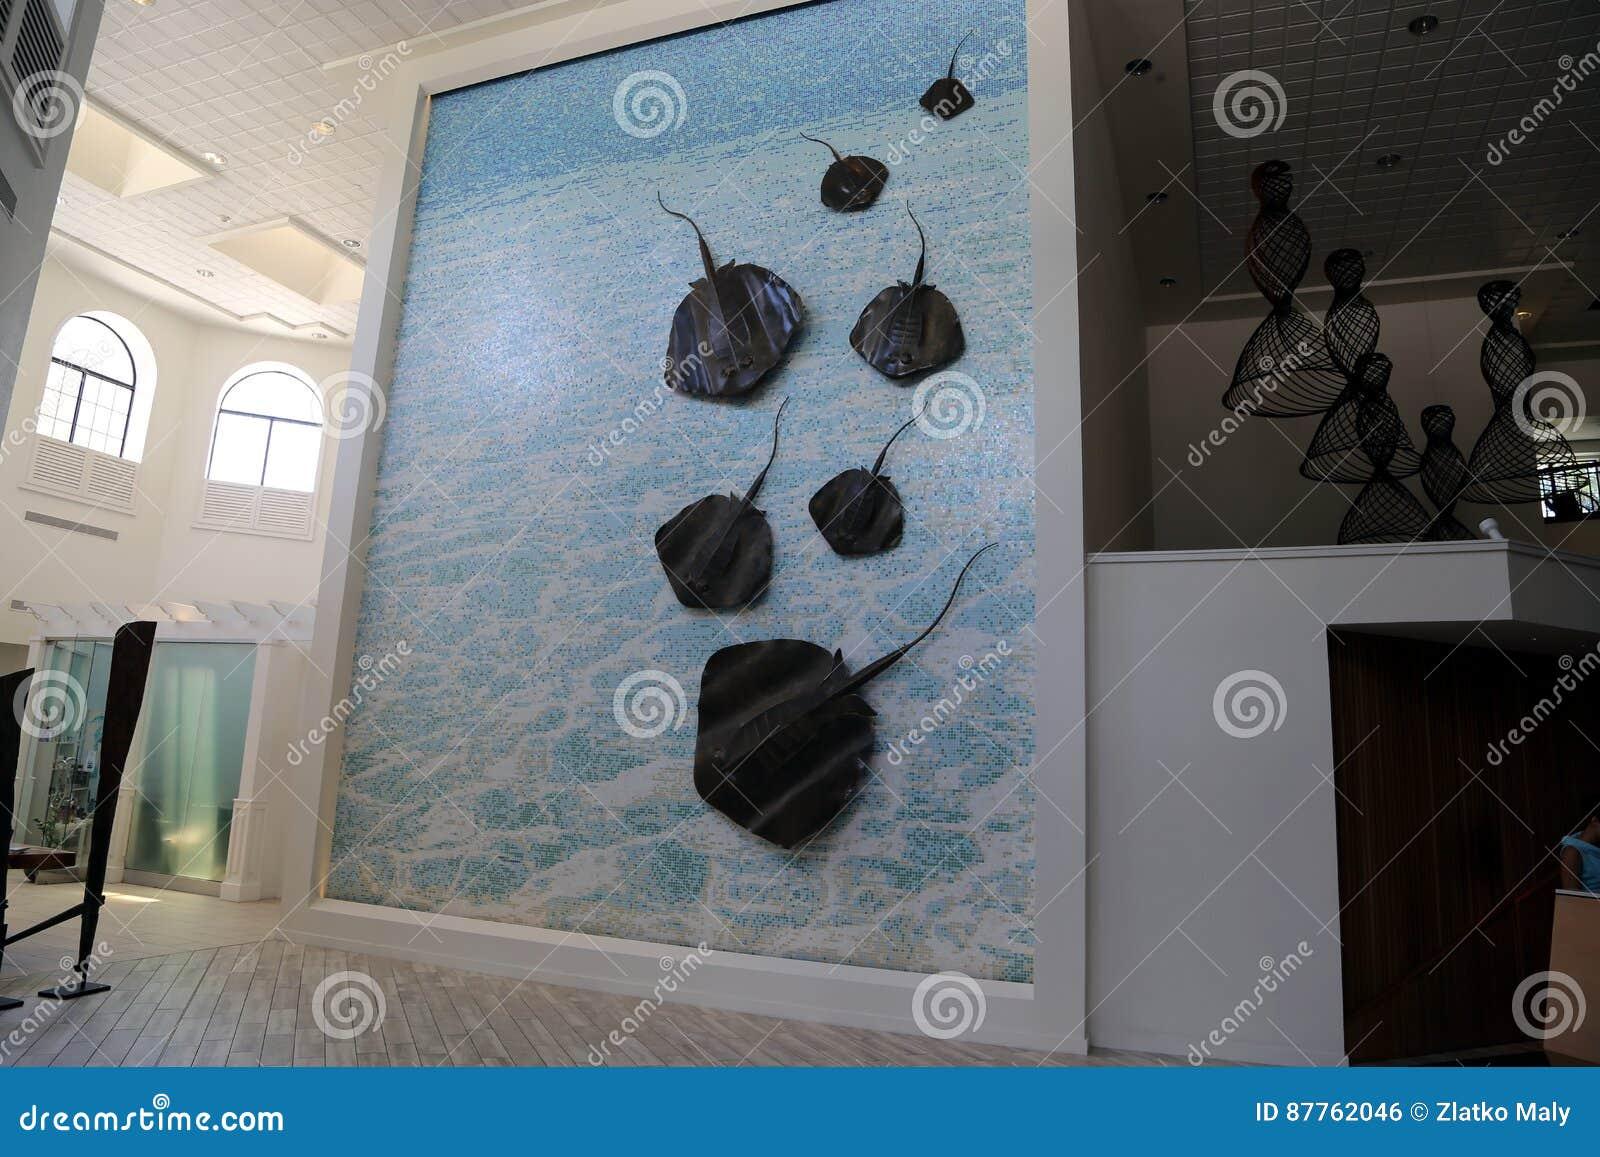 Пляжный комплекс Marriott Кеймана Grand Cayman Island_Grand на 7 милях пляжа в Джорджтауне